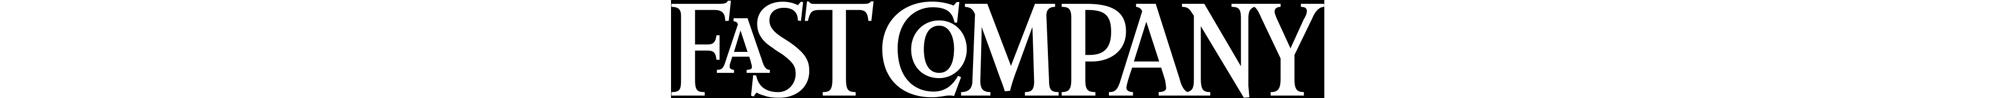 retronaut-logos-fastco-banner.png